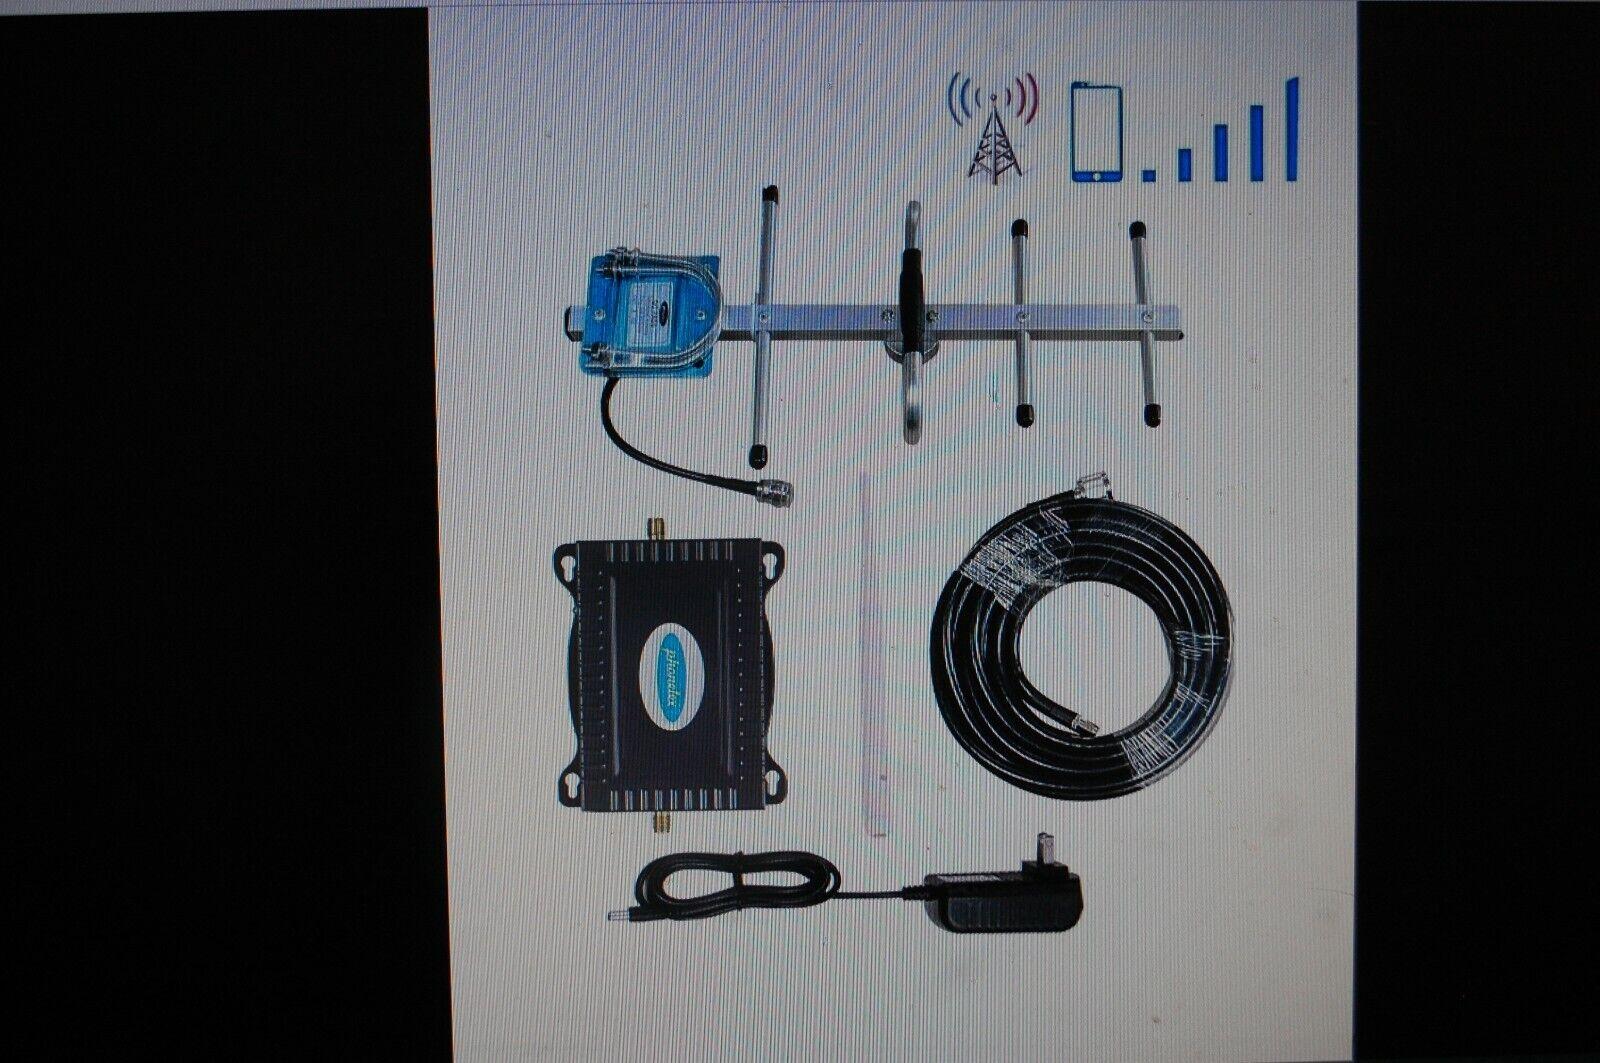 phonelex Verizon Cell Phone Signal Booster 4G LTE Band 13 70